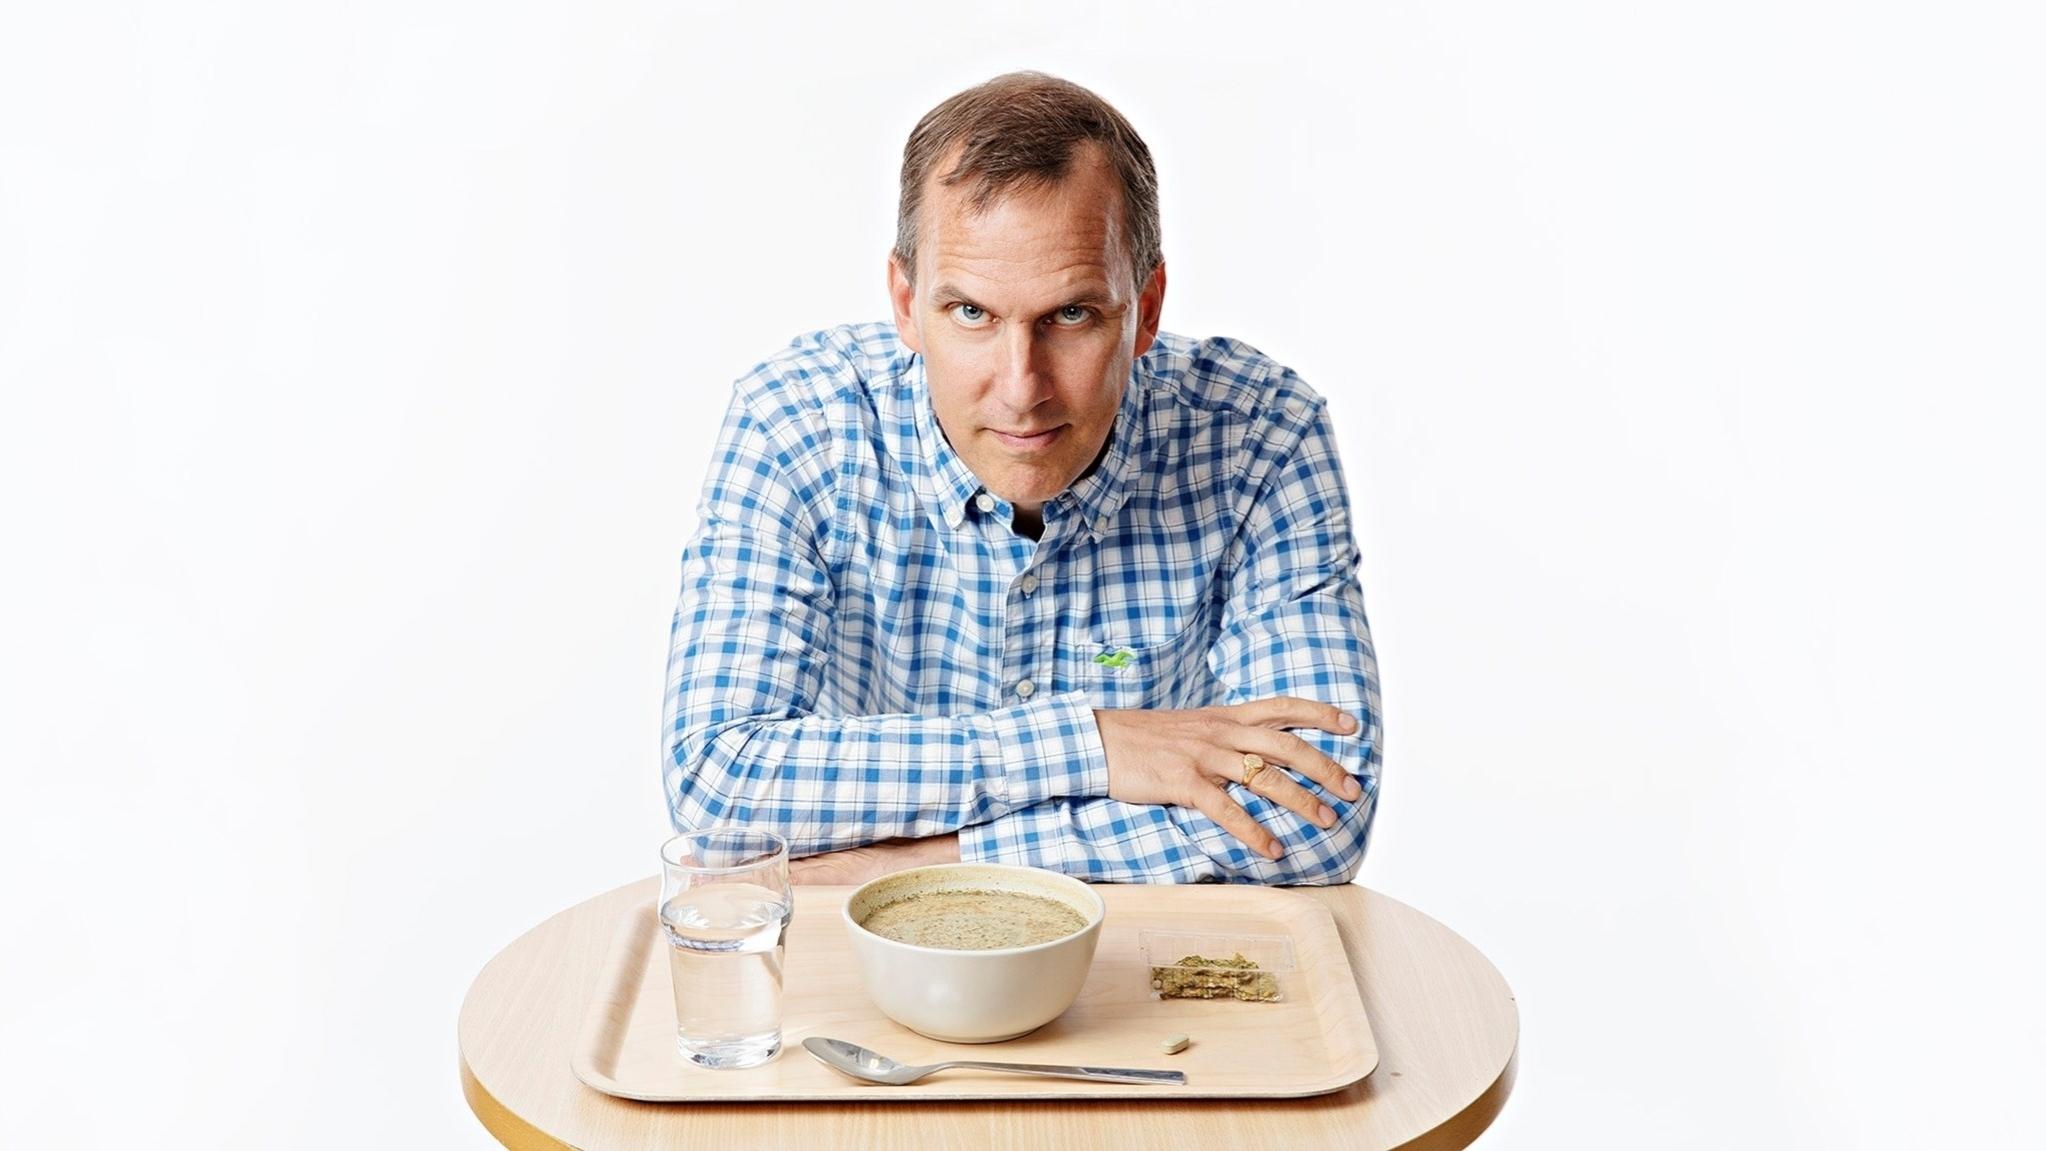 Tjockan lättar vid fetmahorisonten : Johan Bergendorff, global hälsokorrespondent